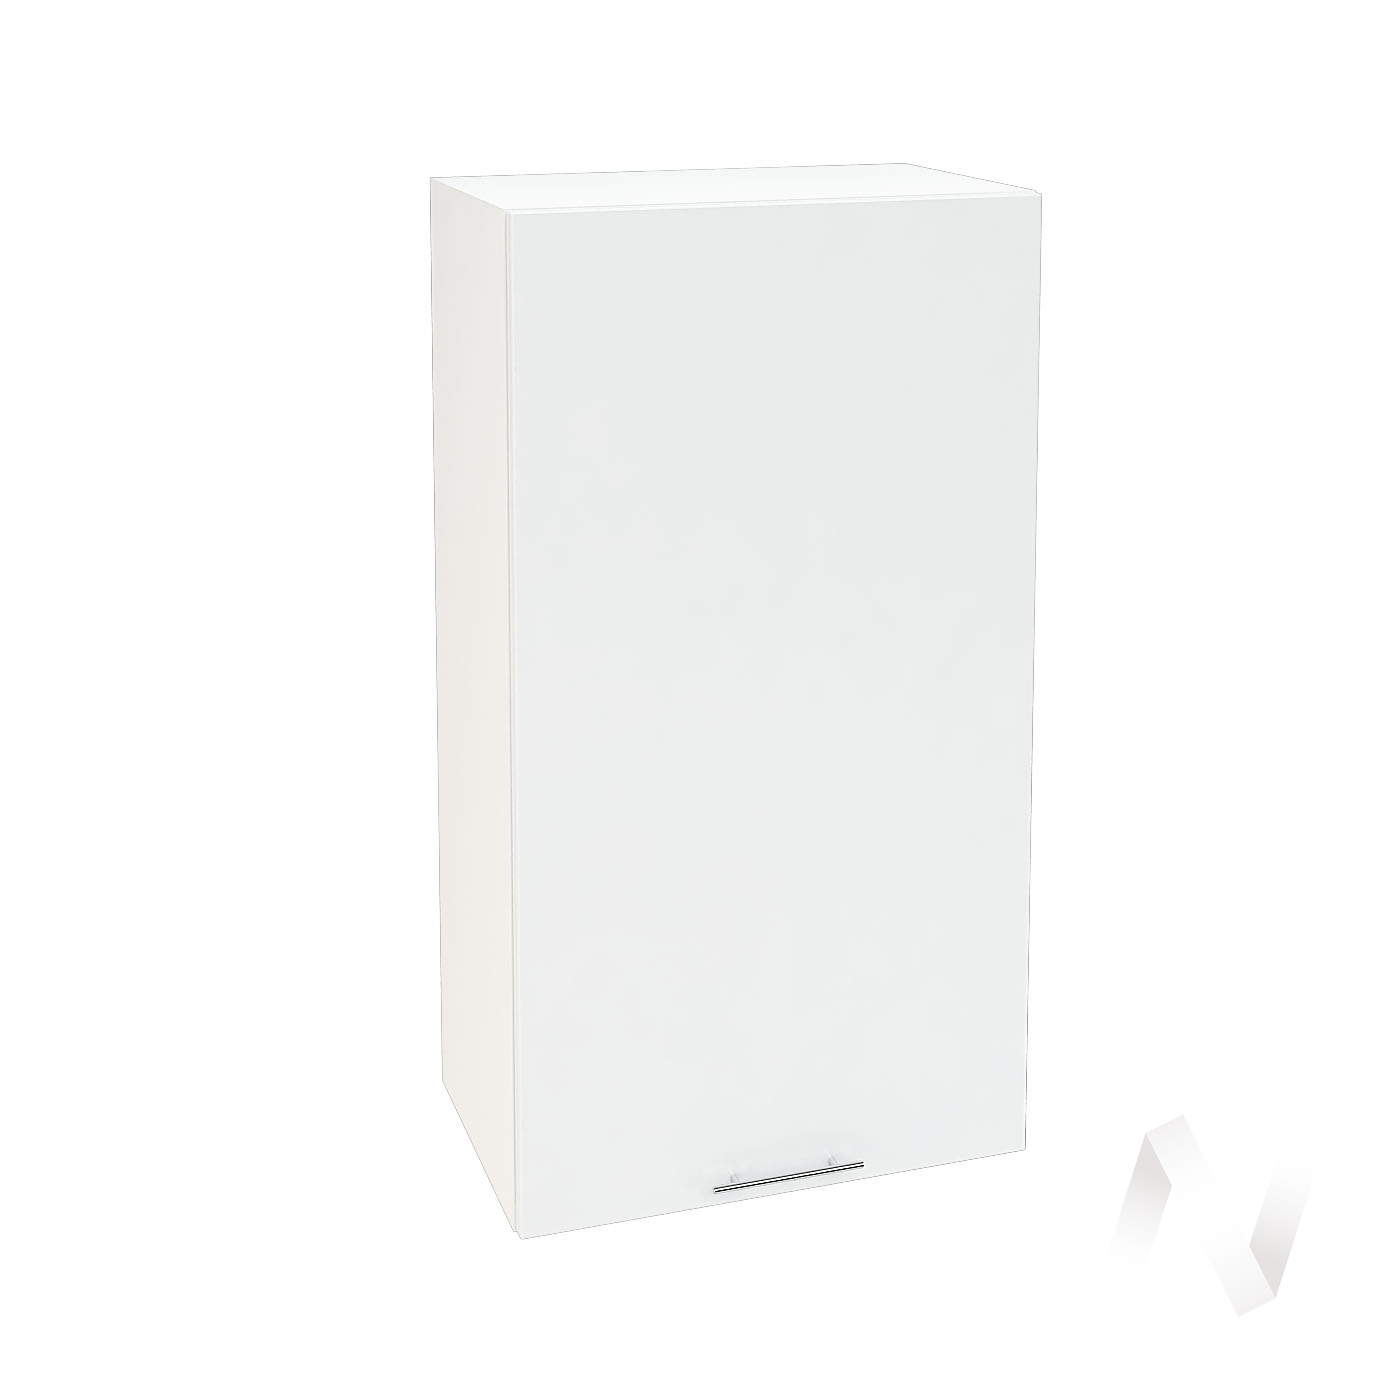 "Кухня ""Валерия-М"": Шкаф верхний 509, ШВ 509 (белый глянец/корпус белый)"